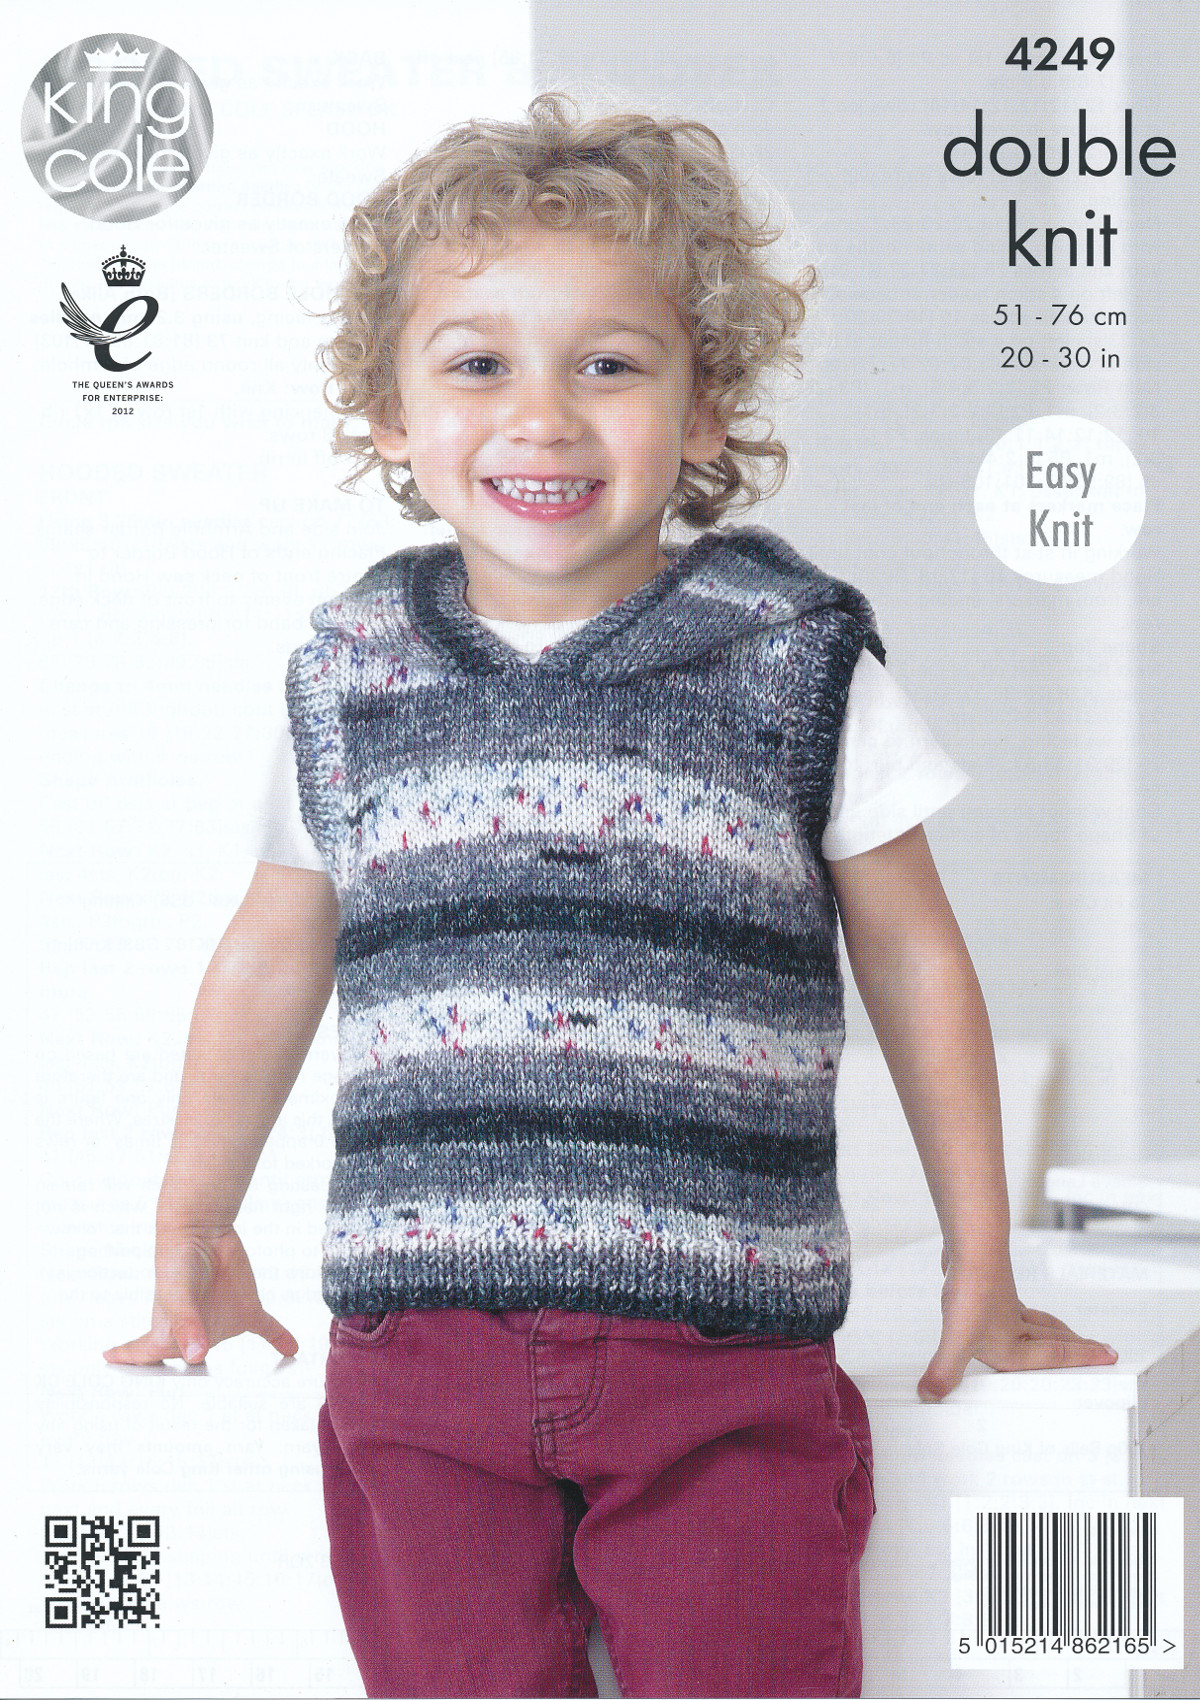 King Cole Knitting Pattern 3318 : Kids Double Knitting Pattern King Cole Hooded Jumper Pullover Splash DK 4249 ...